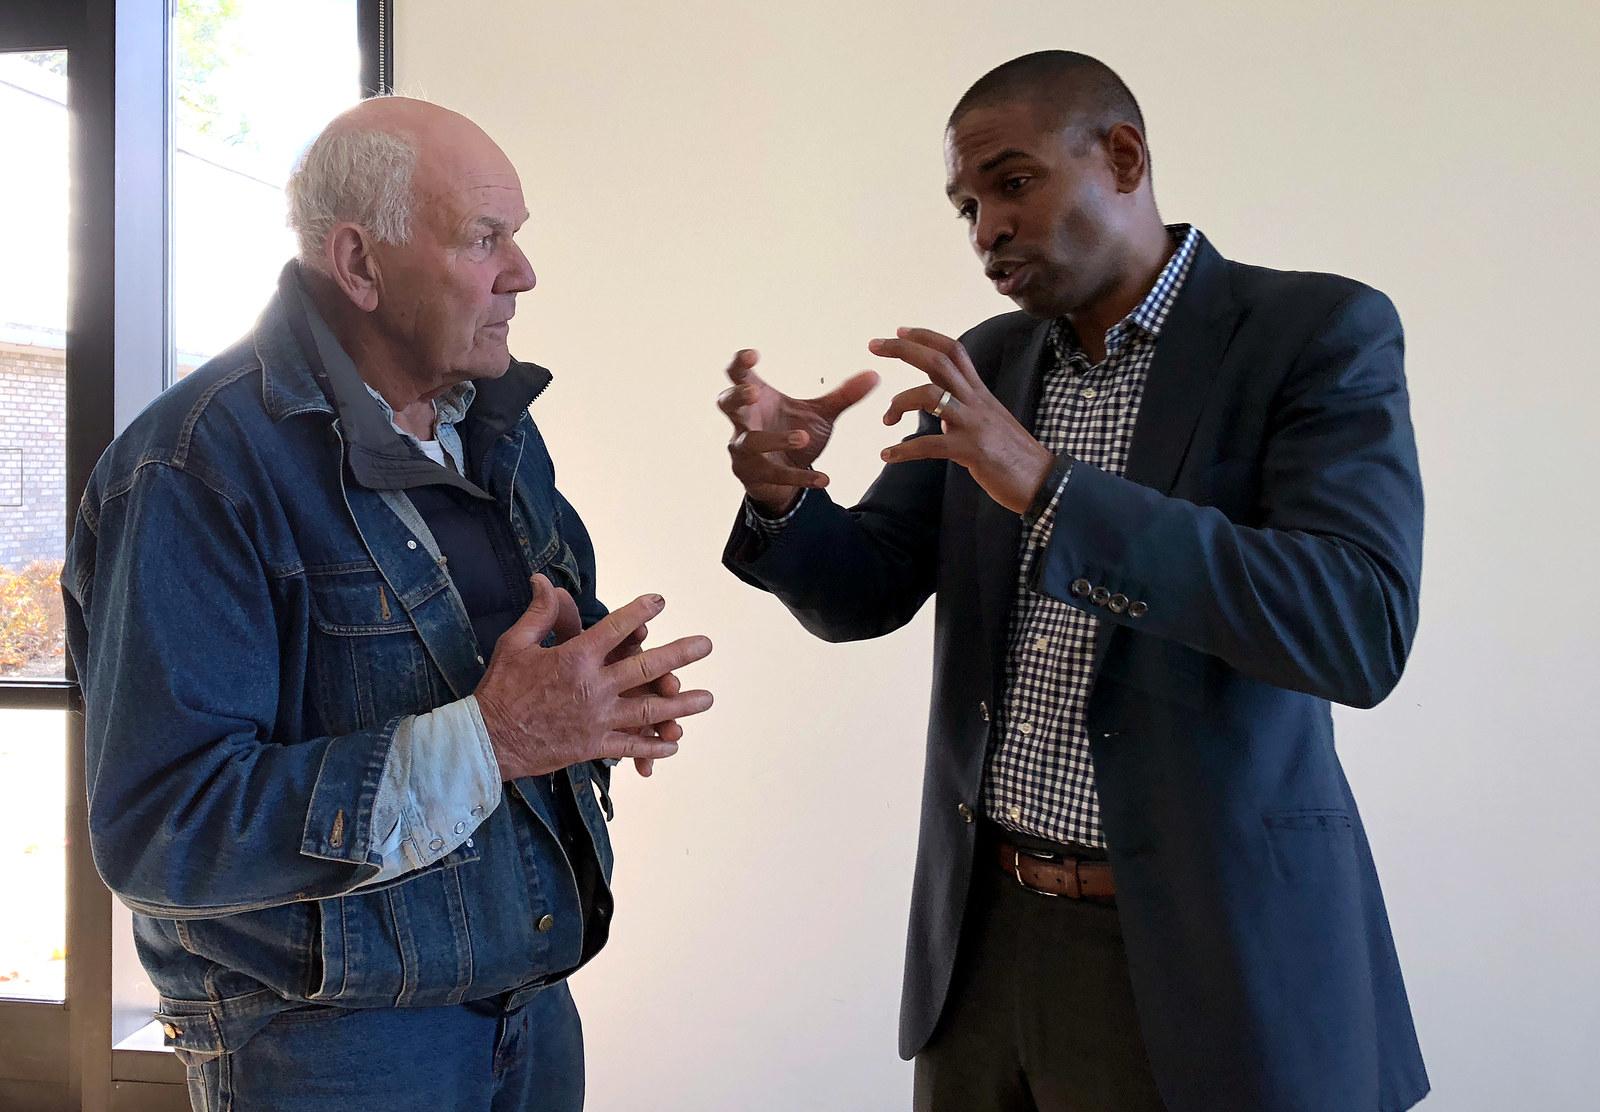 Antonio Delgado (right) talks to a voter following a campaign even in Canajoharie, New York, Oct. 20.